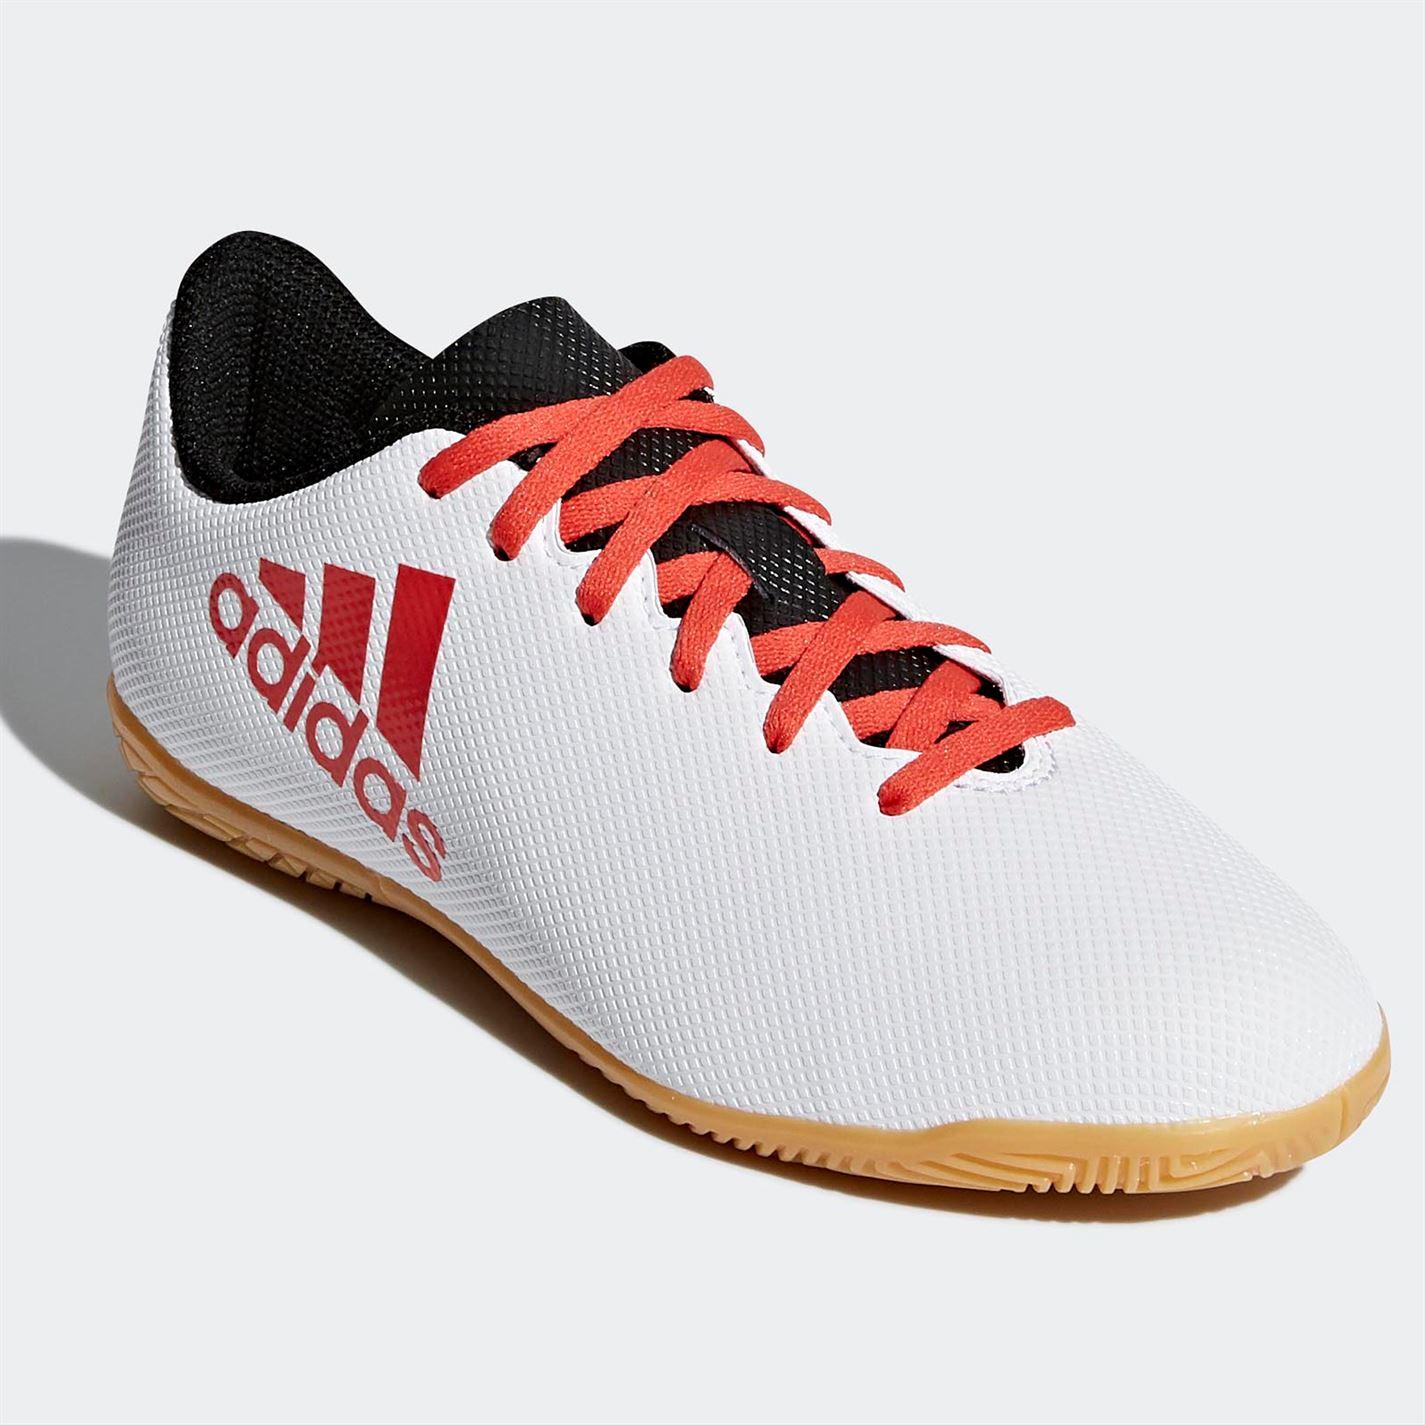 super popular e578b cc943 adidas-X-Tango-17-4-Childrens-Indoor-Football-